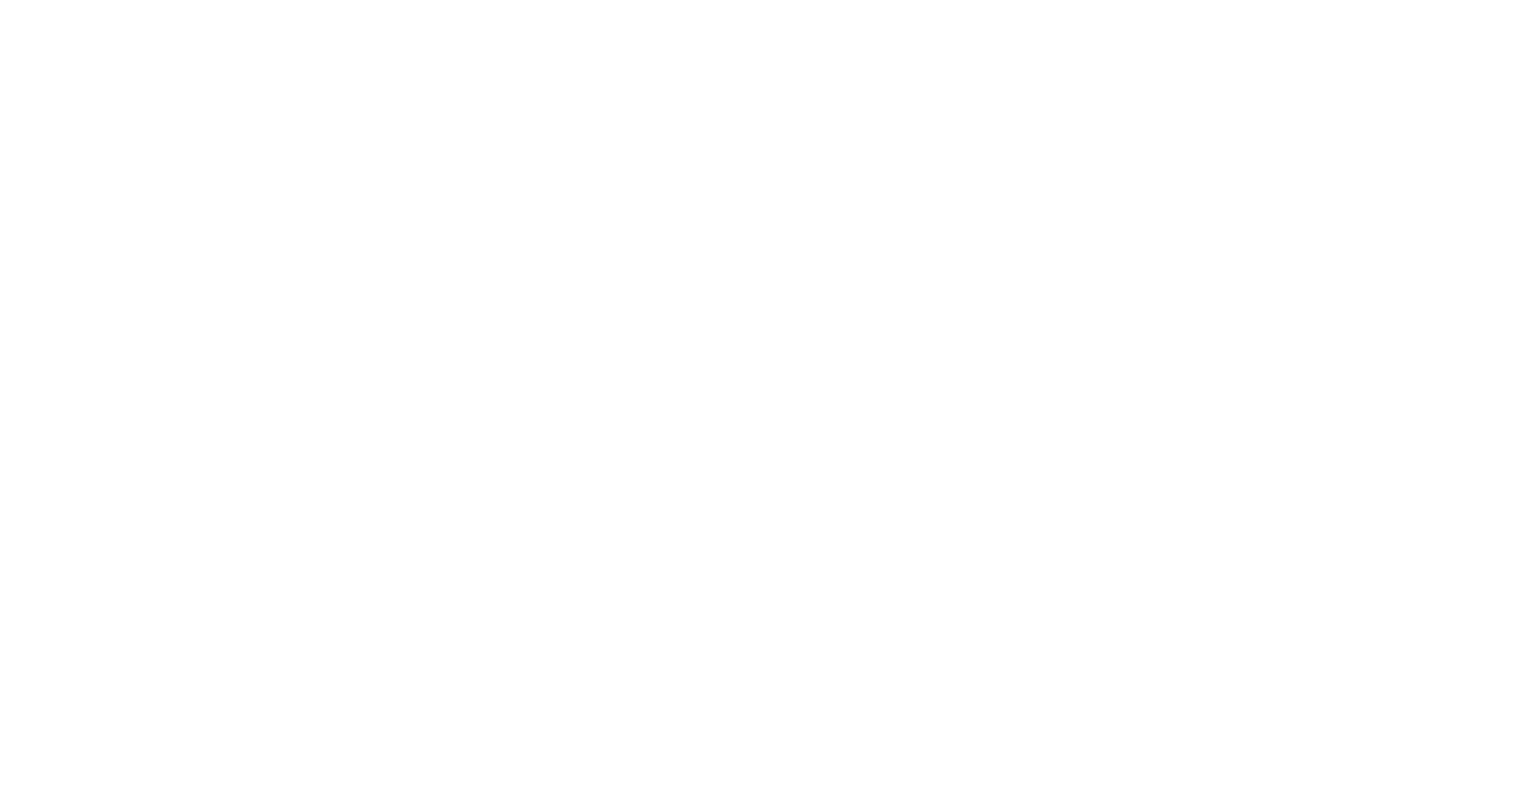 tierra-vida-logo-white-04